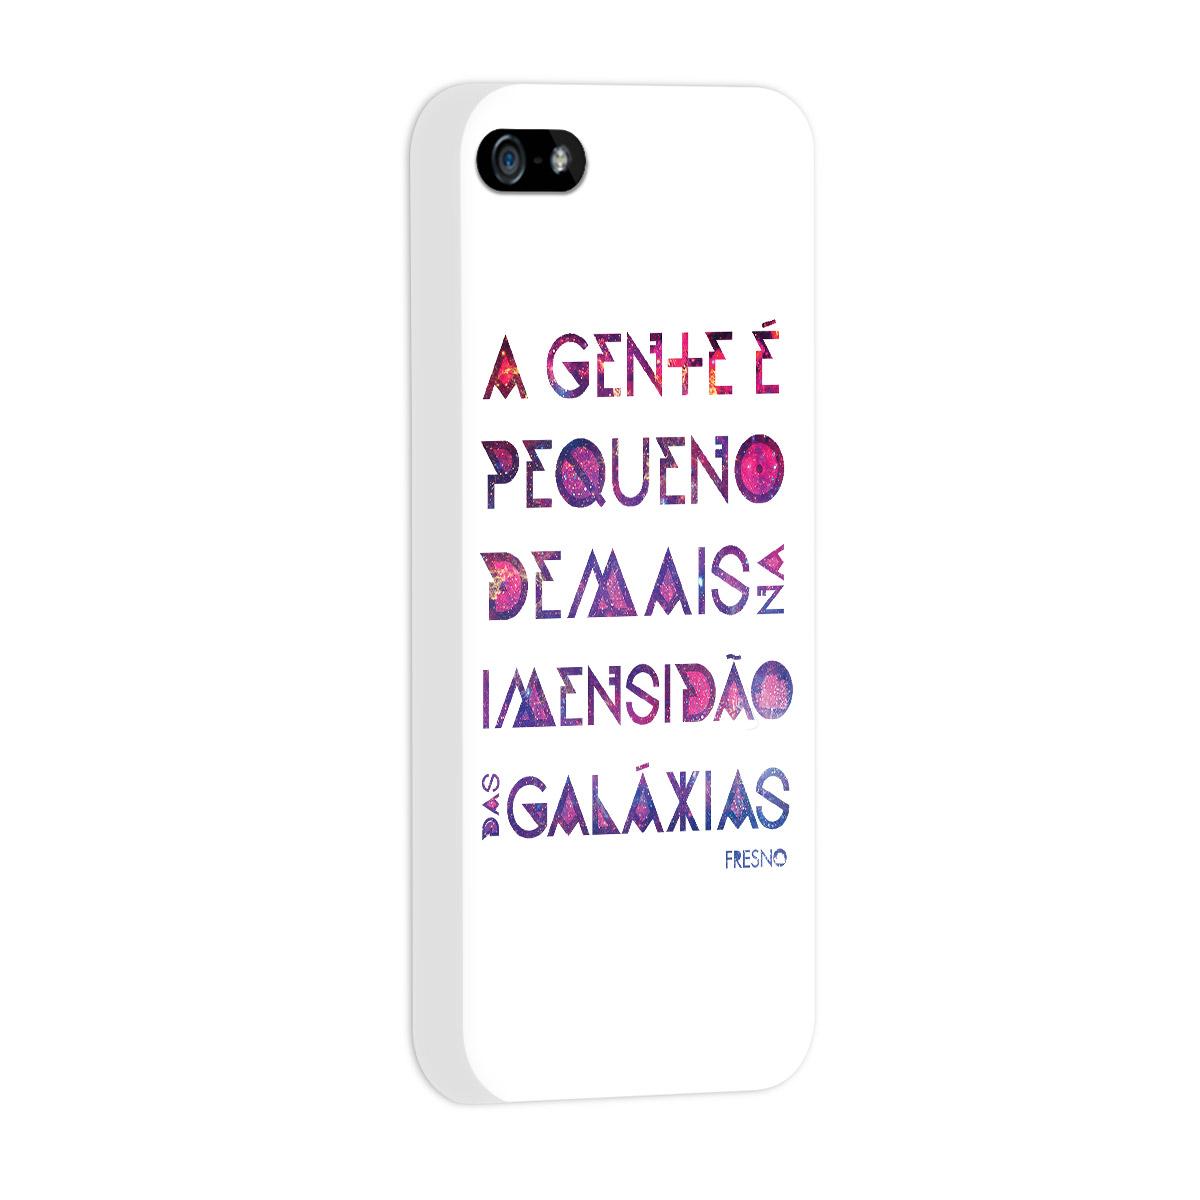 Capa de iPhone 5/5S Fresno Gal�xias